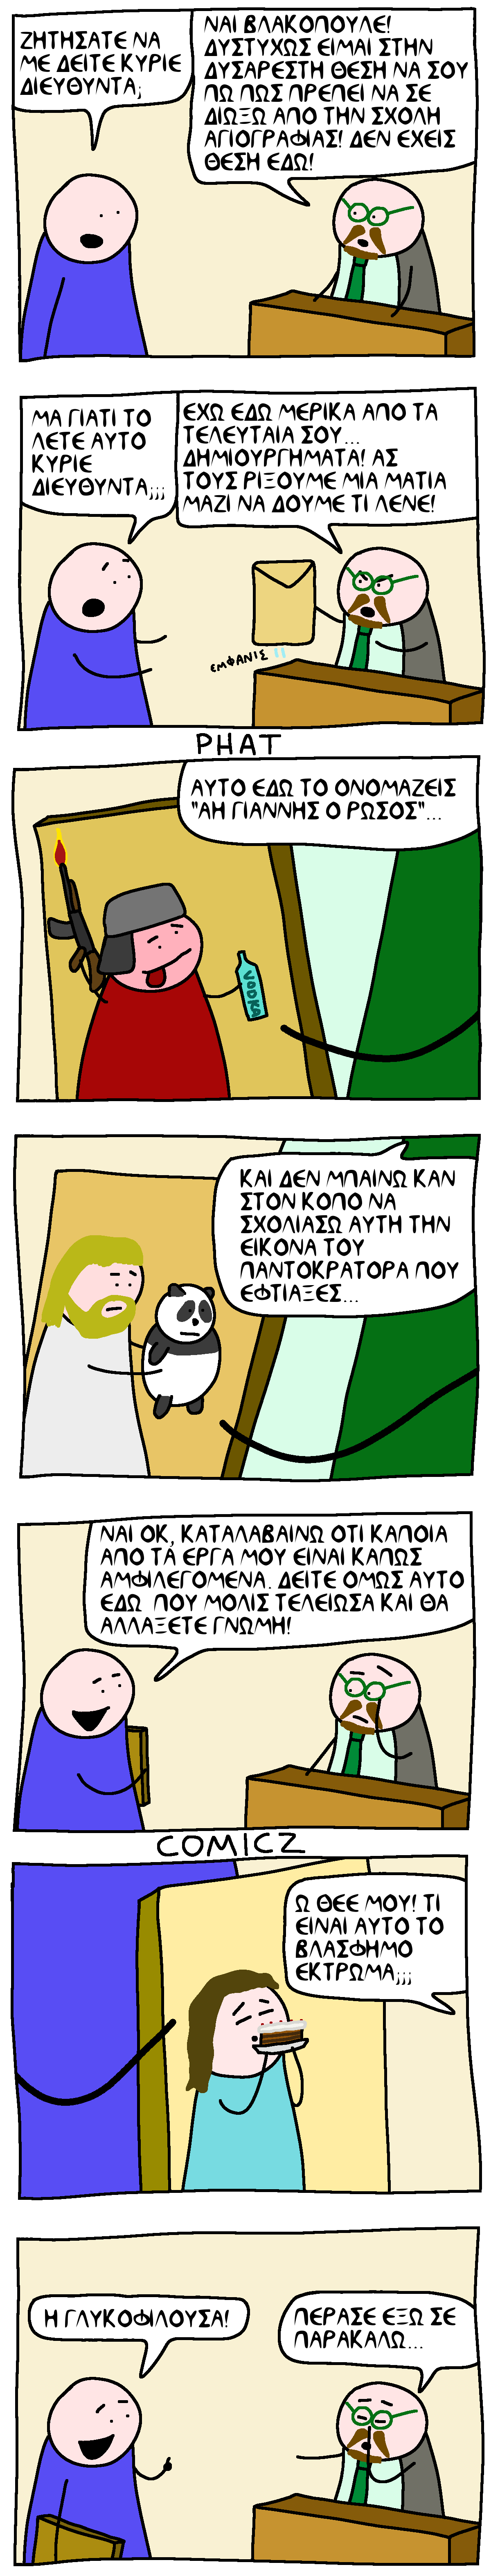 glykofiloysa